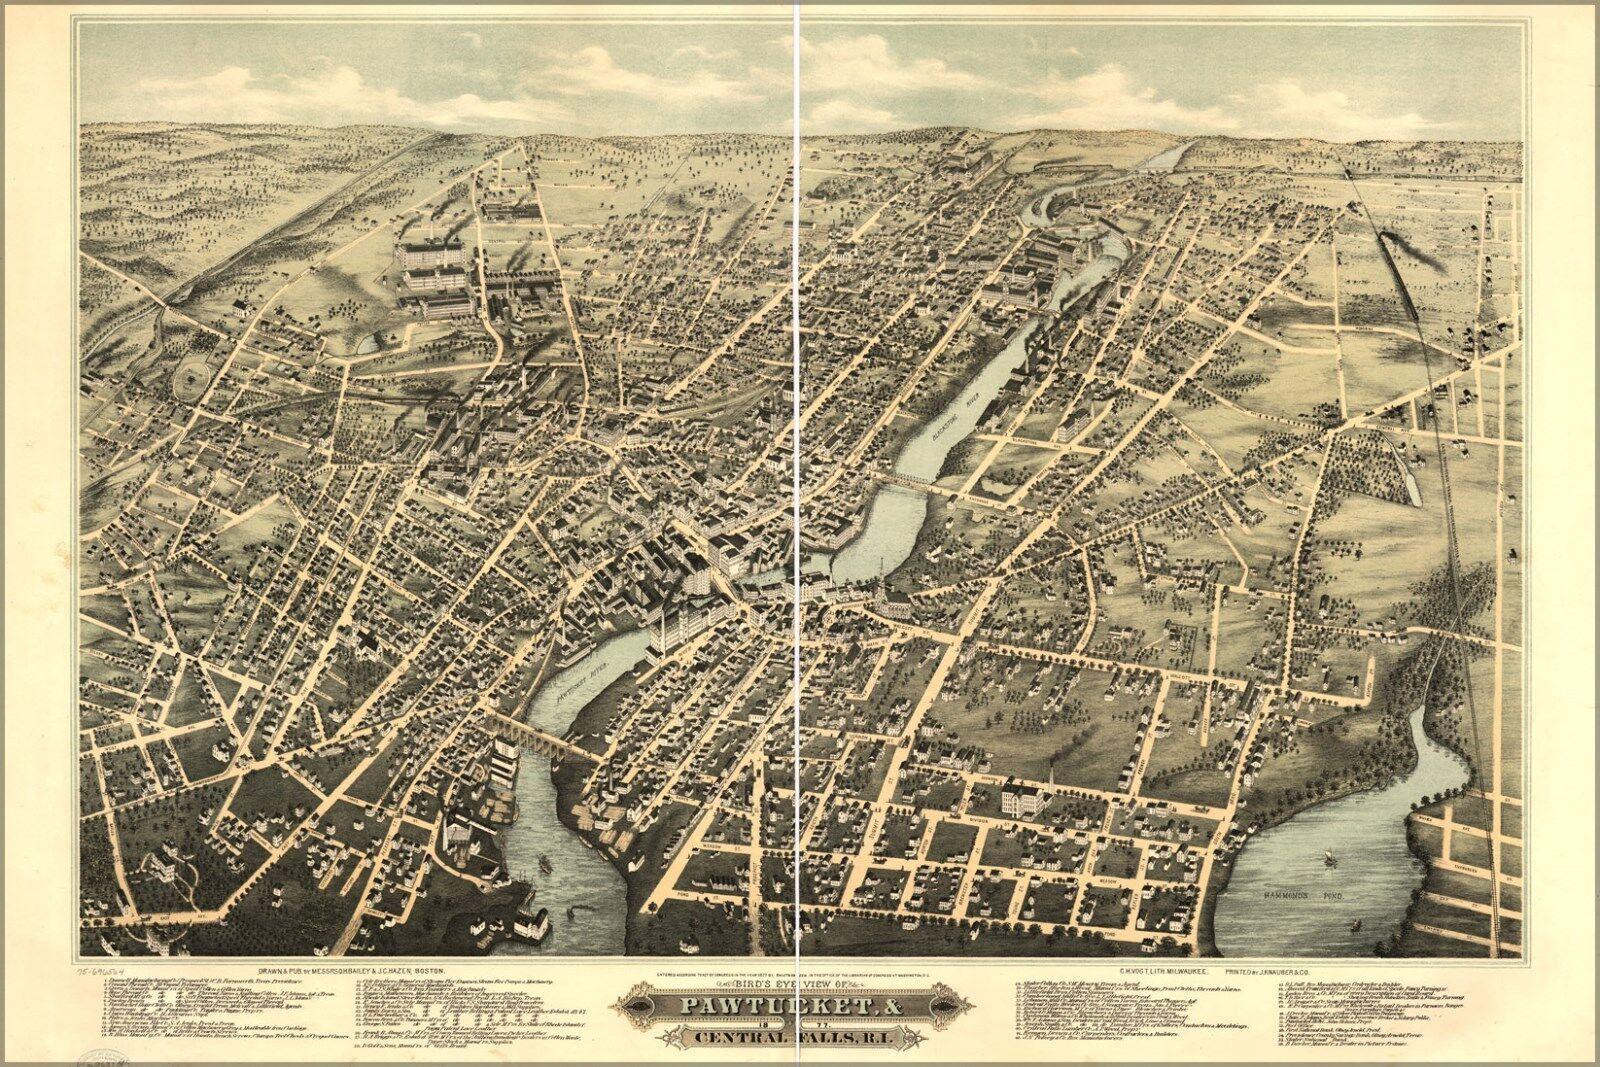 Poster, Many Größes; Map Pawtucket & Central Falls Rhode Island 1877